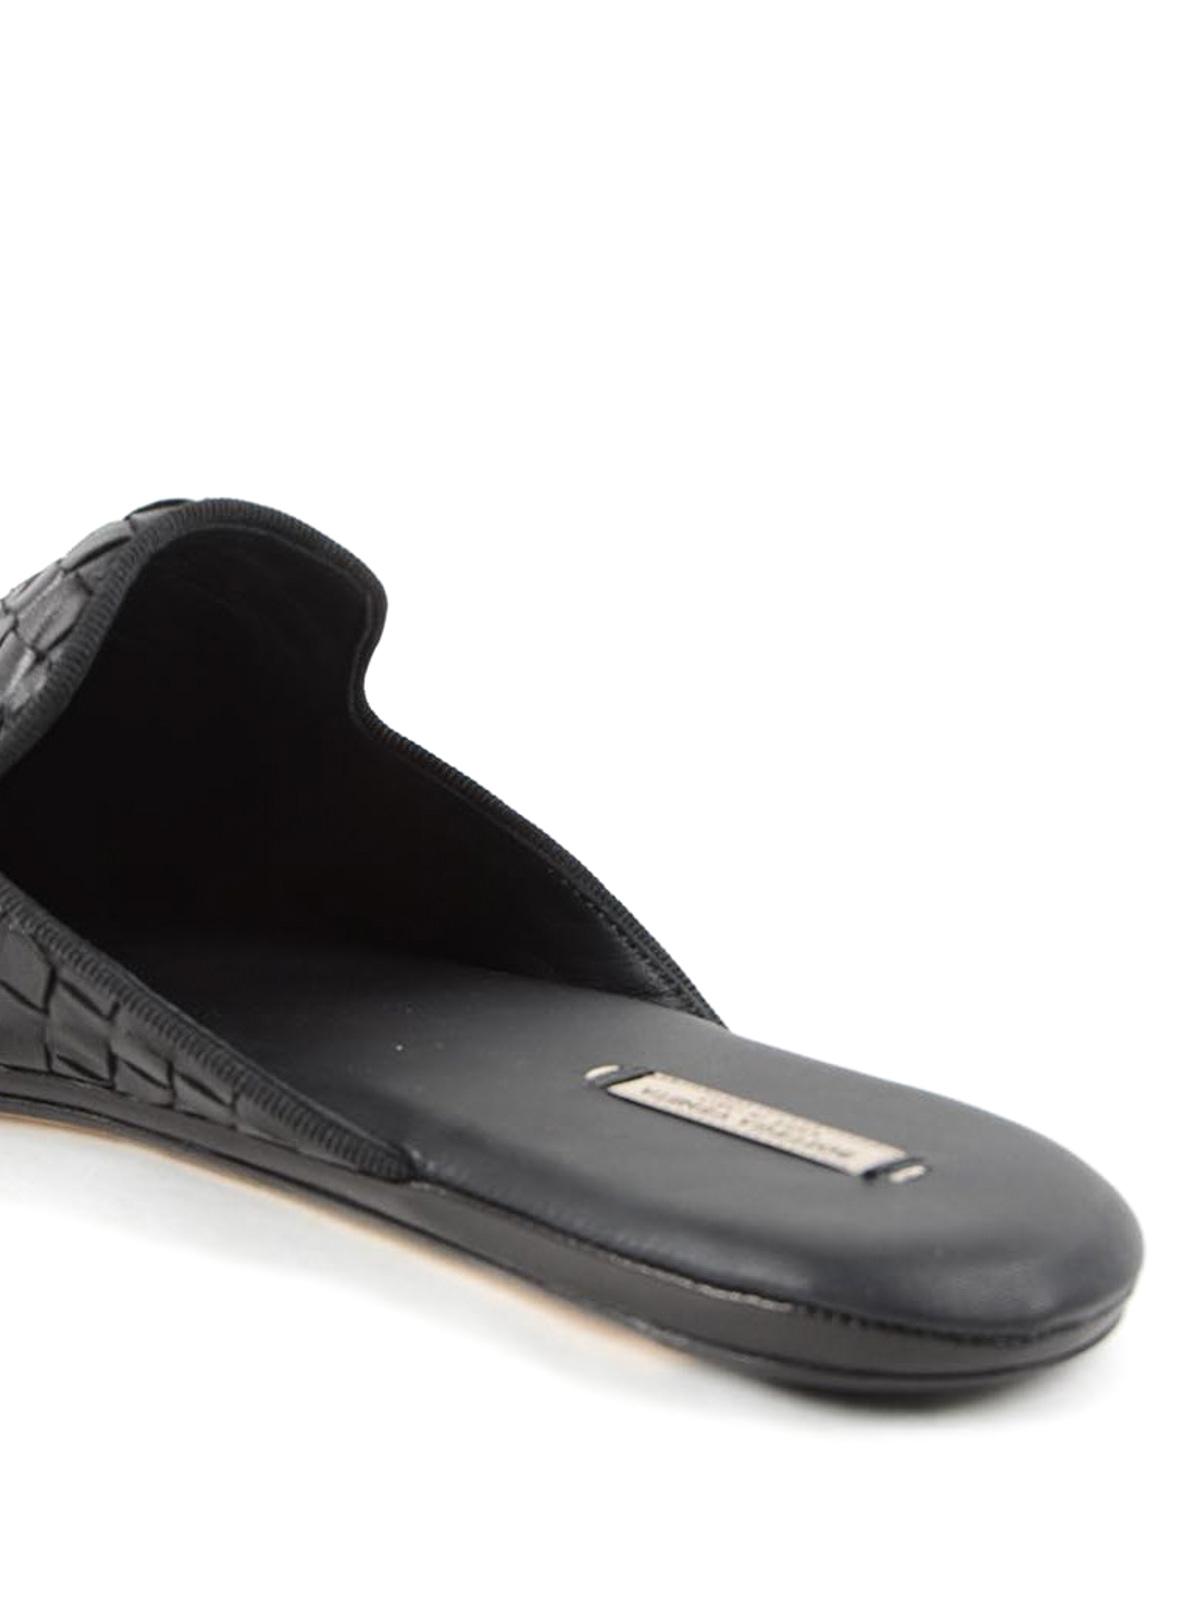 03172490753 iKRIX BOTTEGA VENETA  Loafers   Slippers - Fiandra Intrecciato nappa  slippers